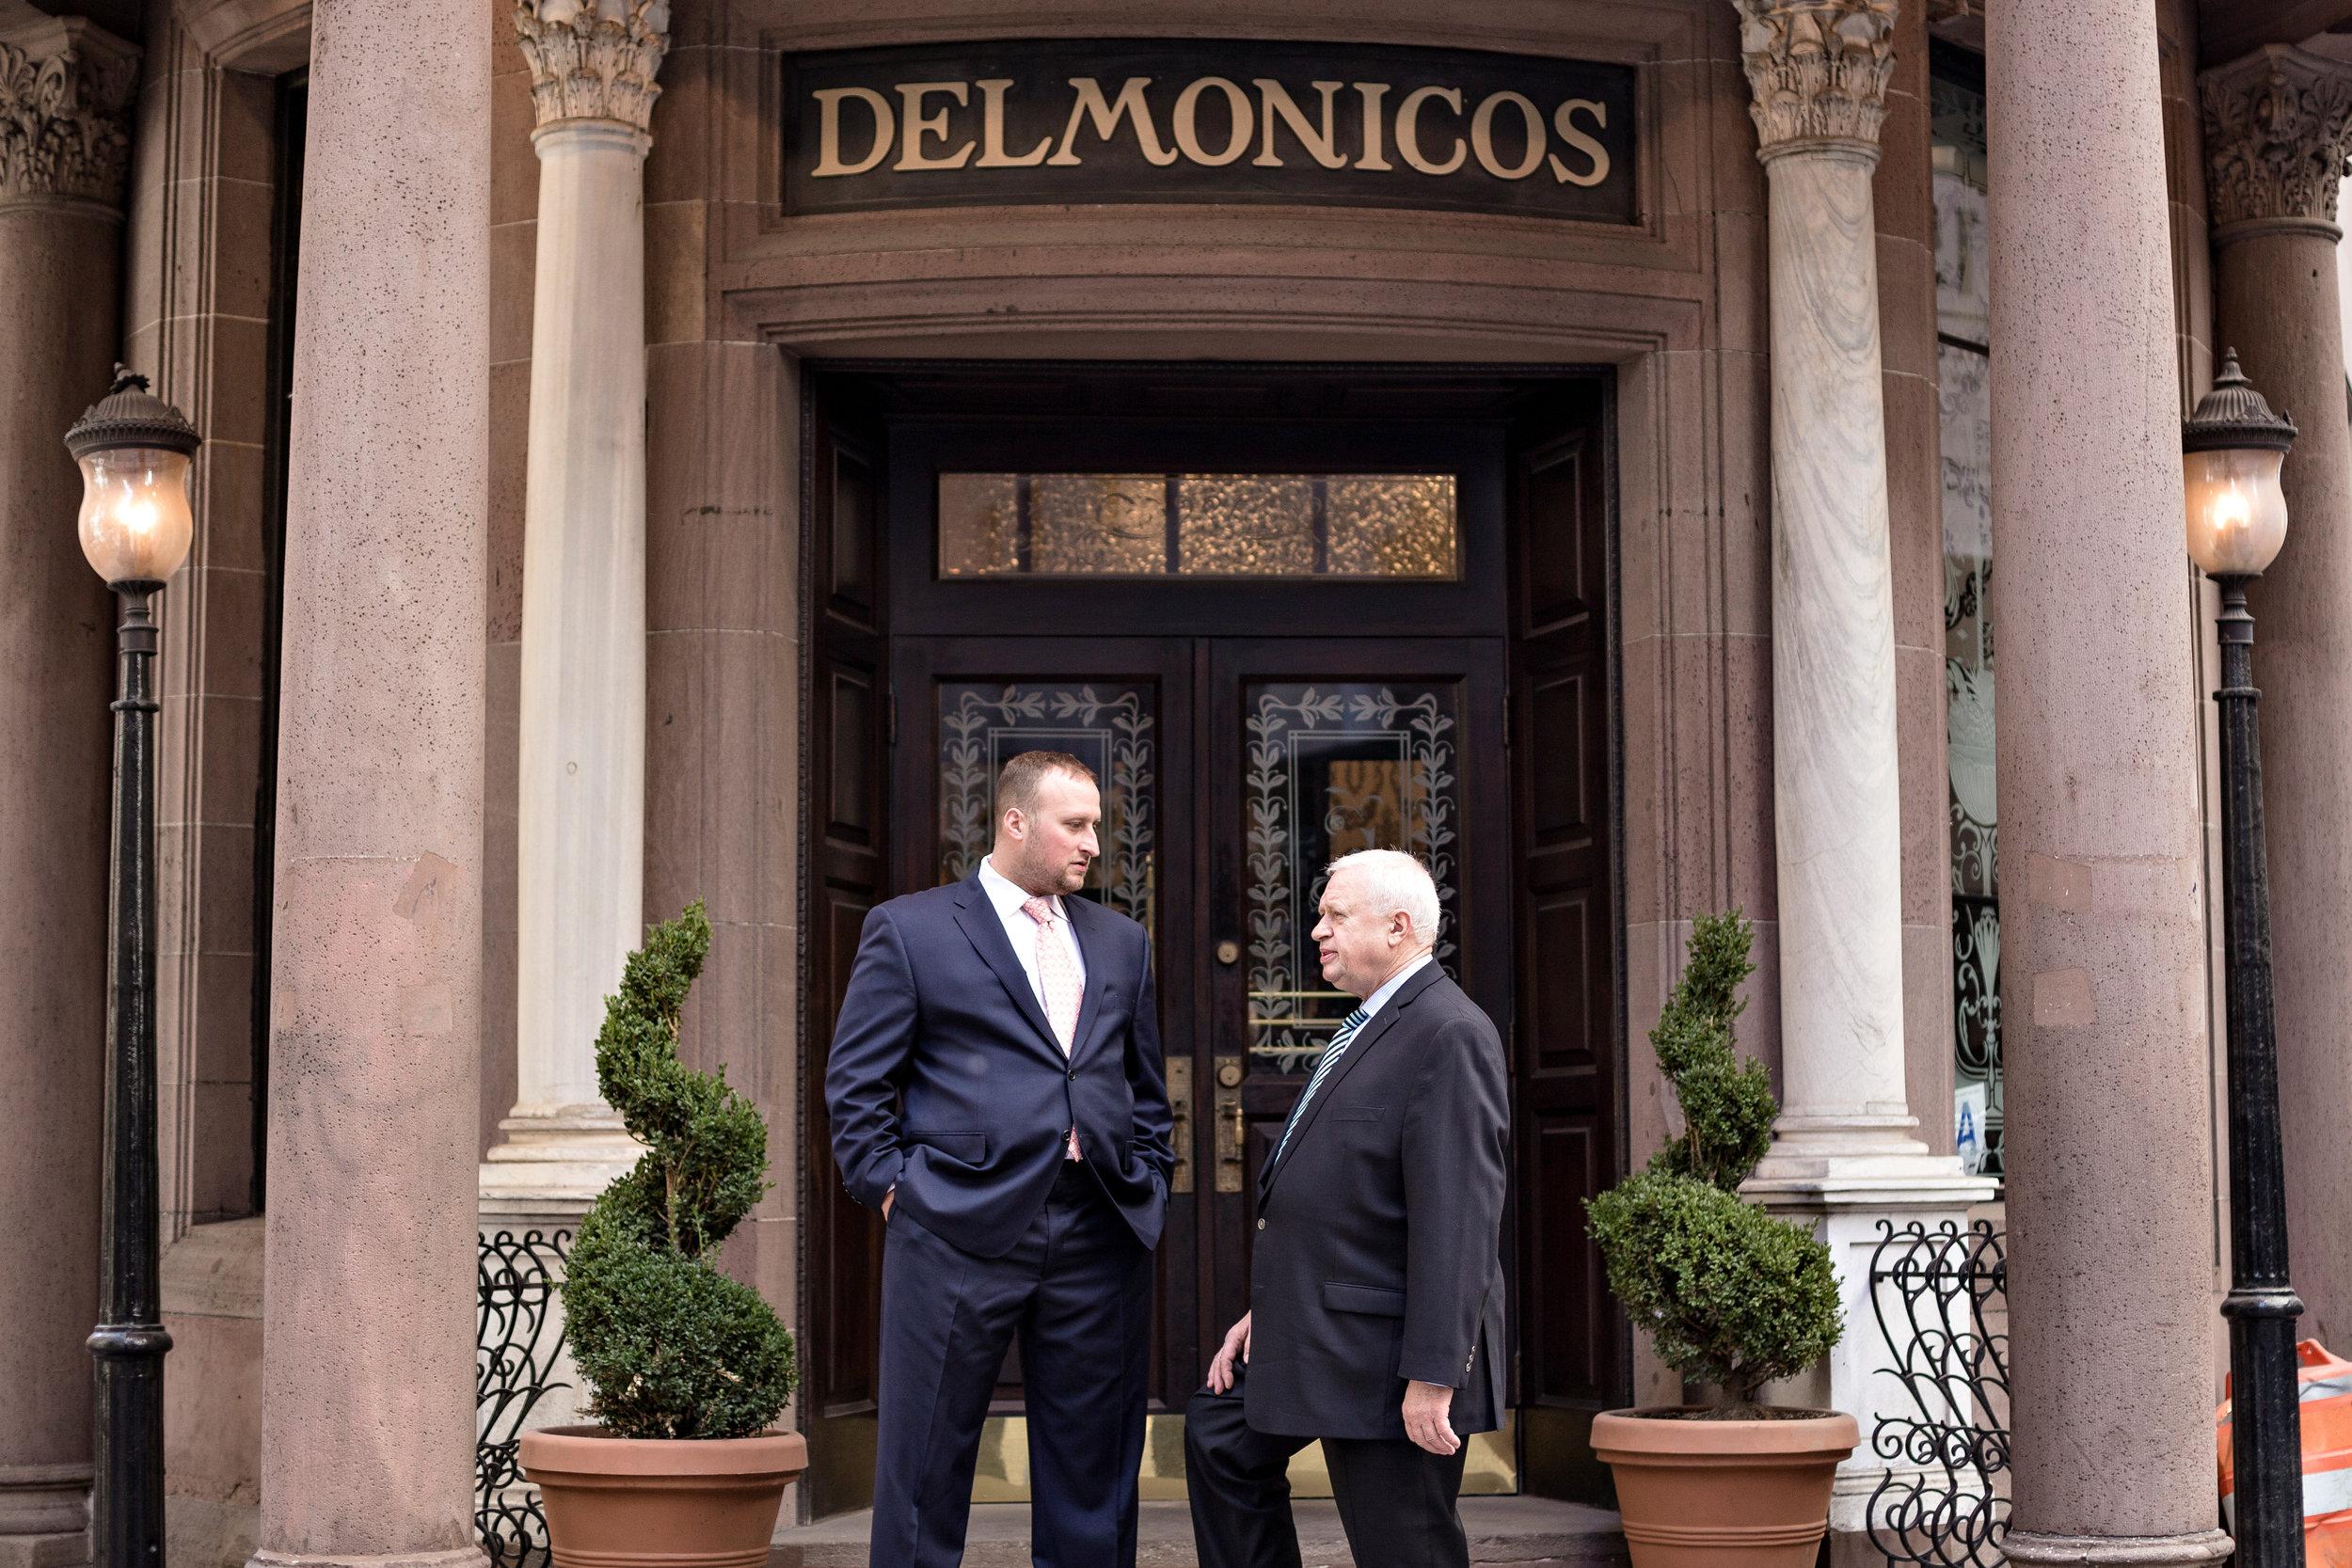 delmonicos2_downtownmag-5.jpg